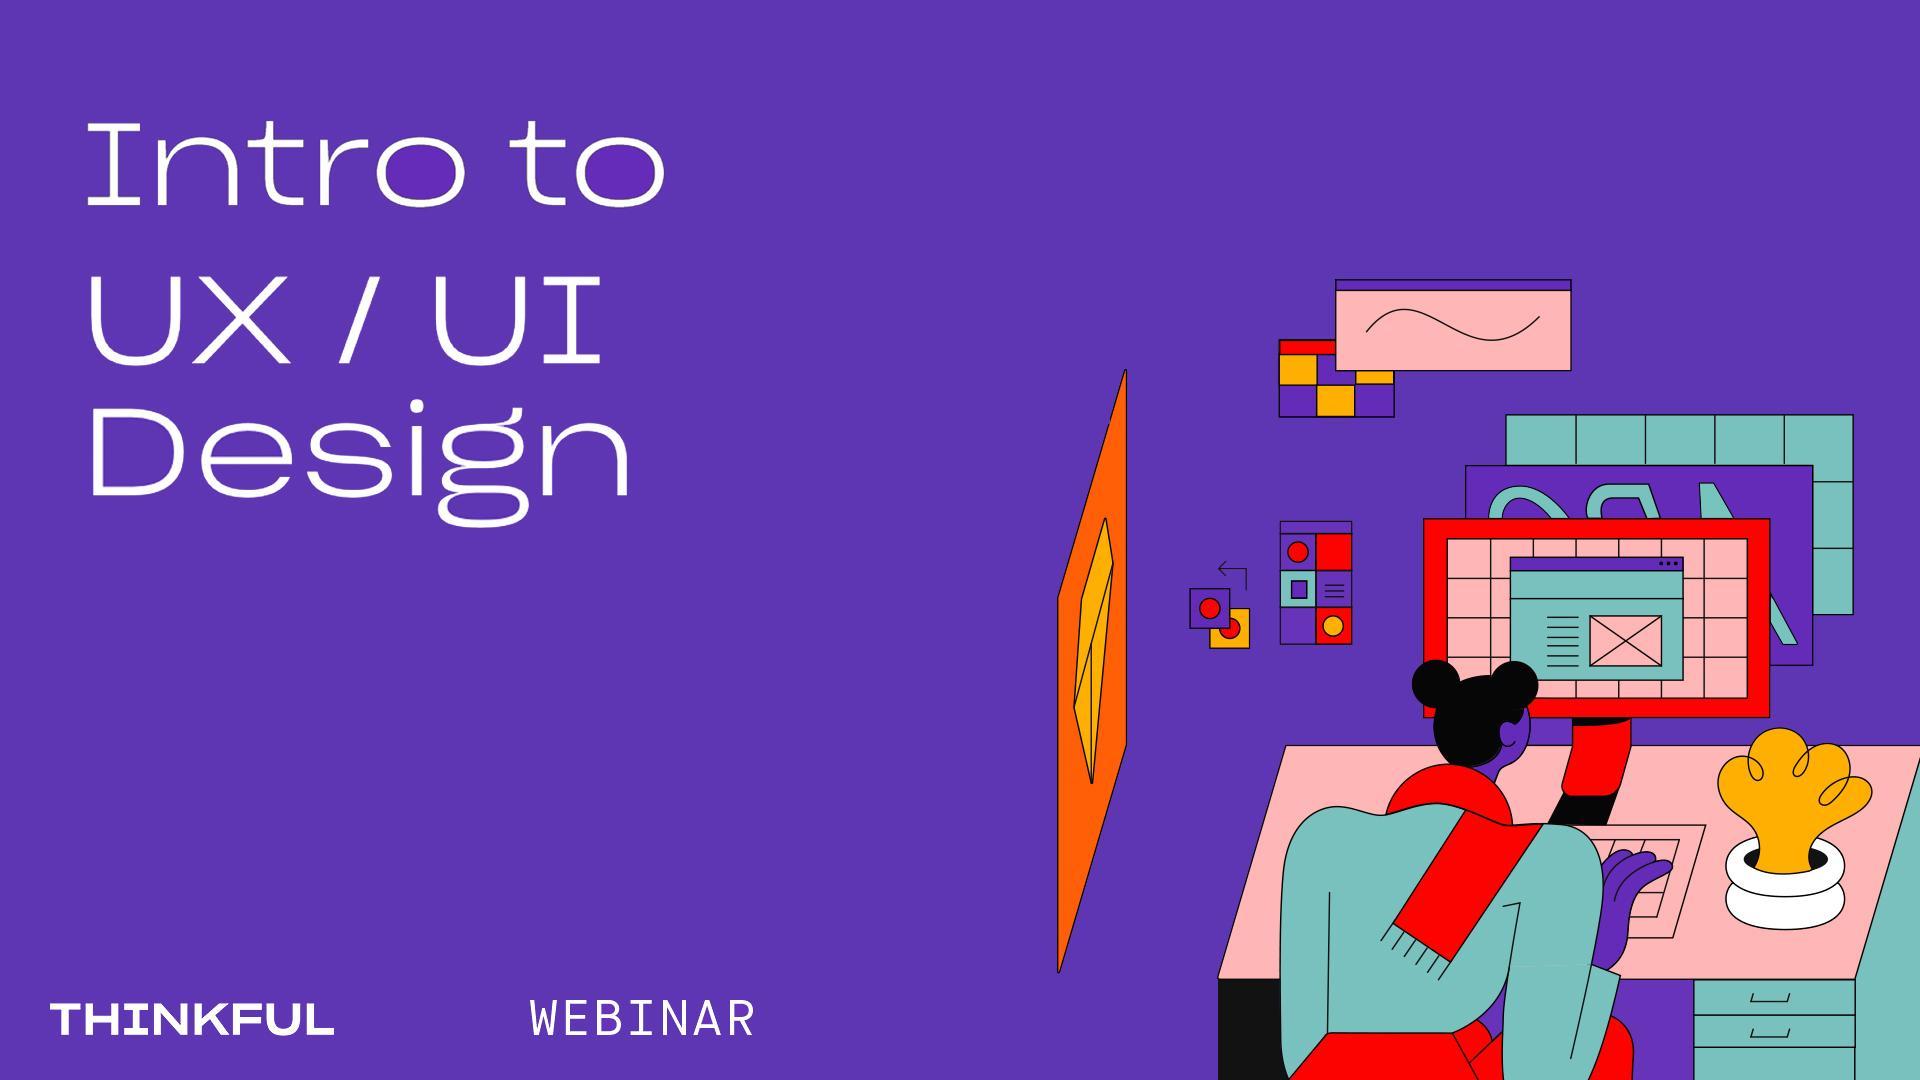 Thinkful Webinar | What is UX/UI Design?